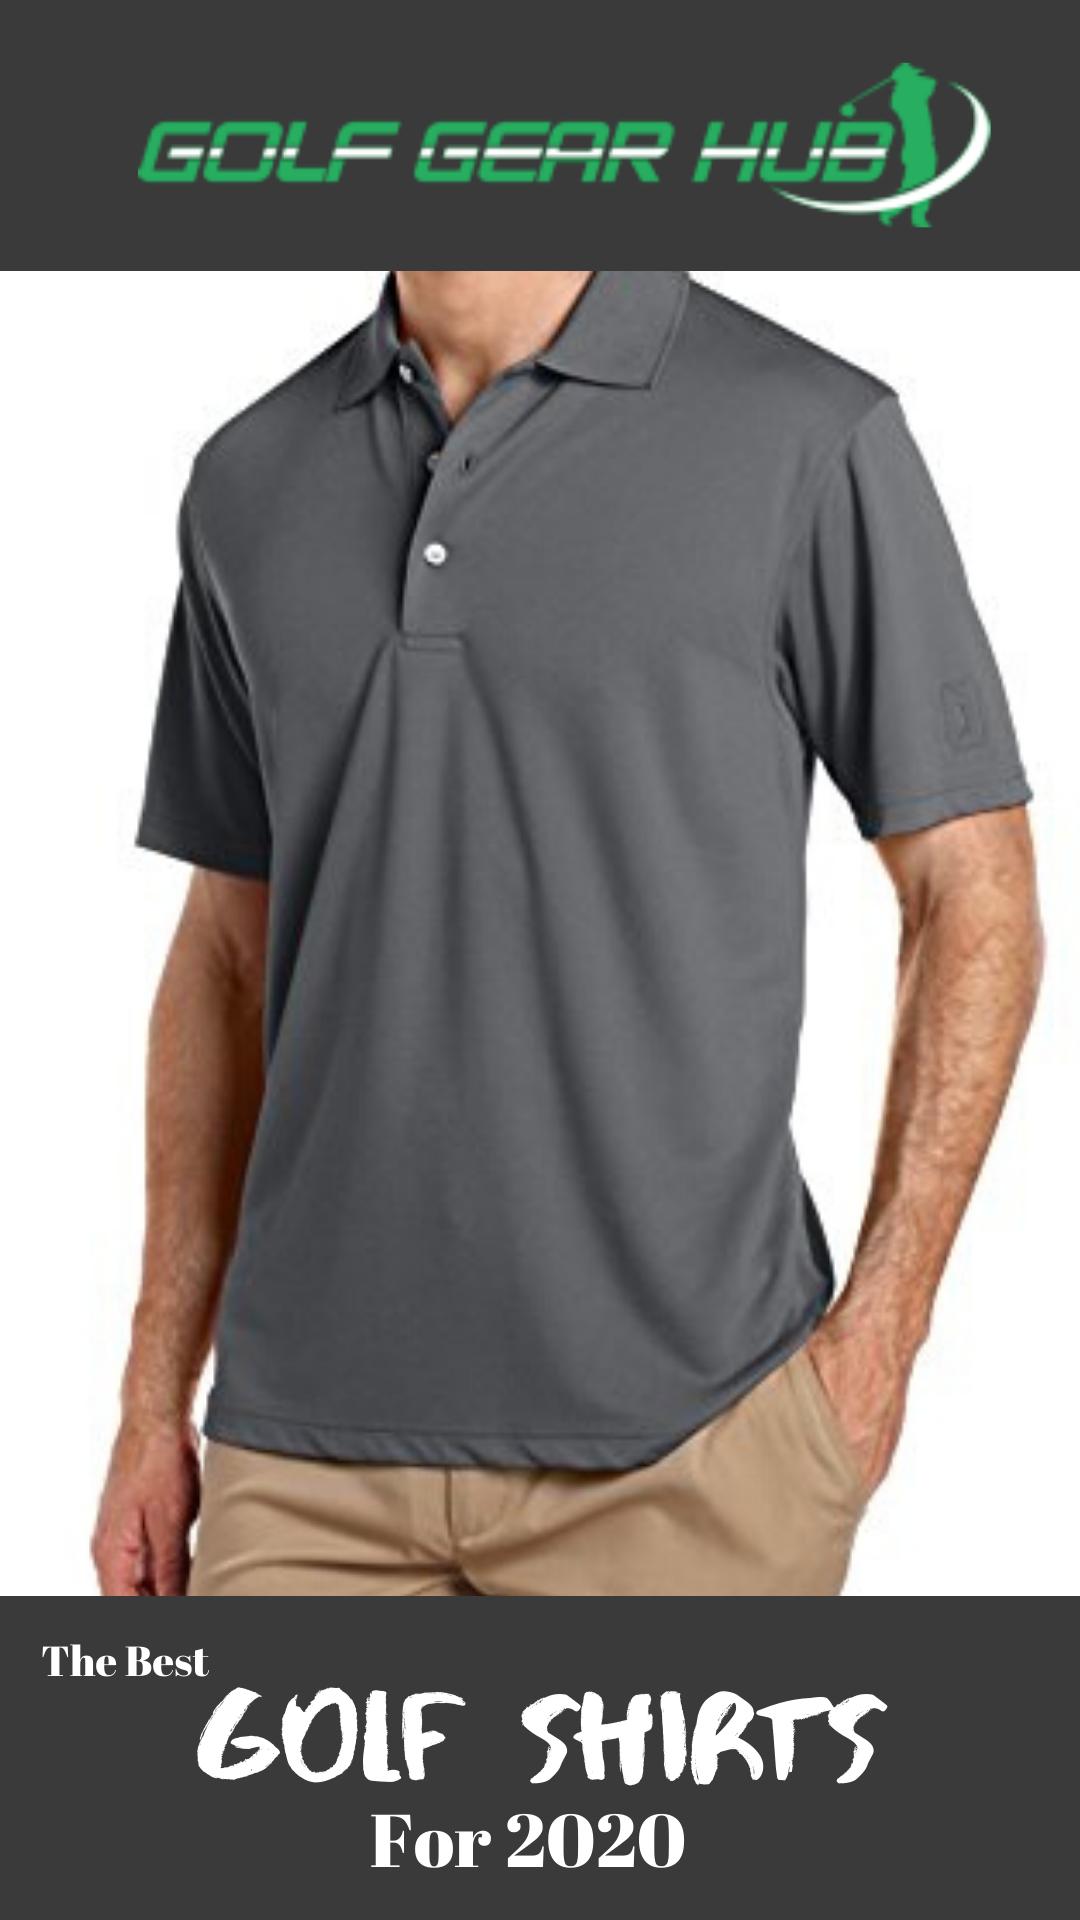 Best Golf Shirts 2020 Lightweight For Hot Weather In 2020 Golf